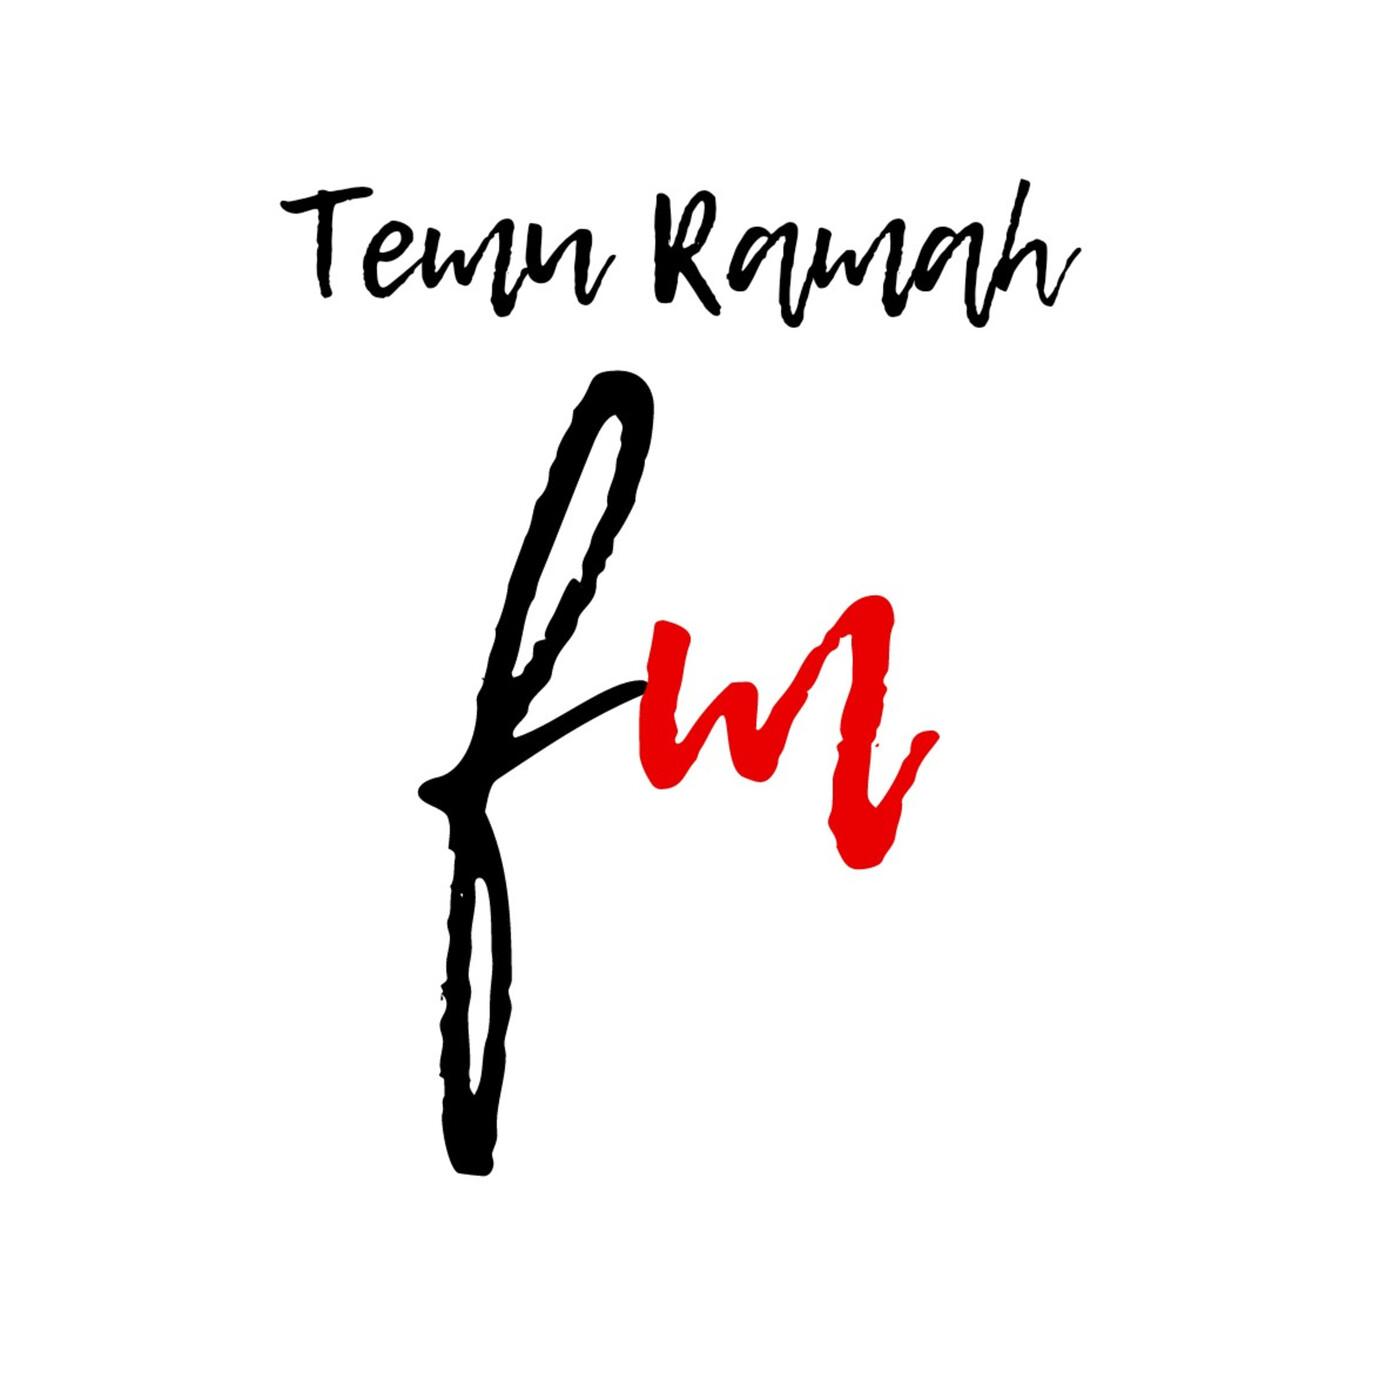 Temu Ramah #19: Ngobrol santai sambil belajar podcast bersama Toni Wahid.